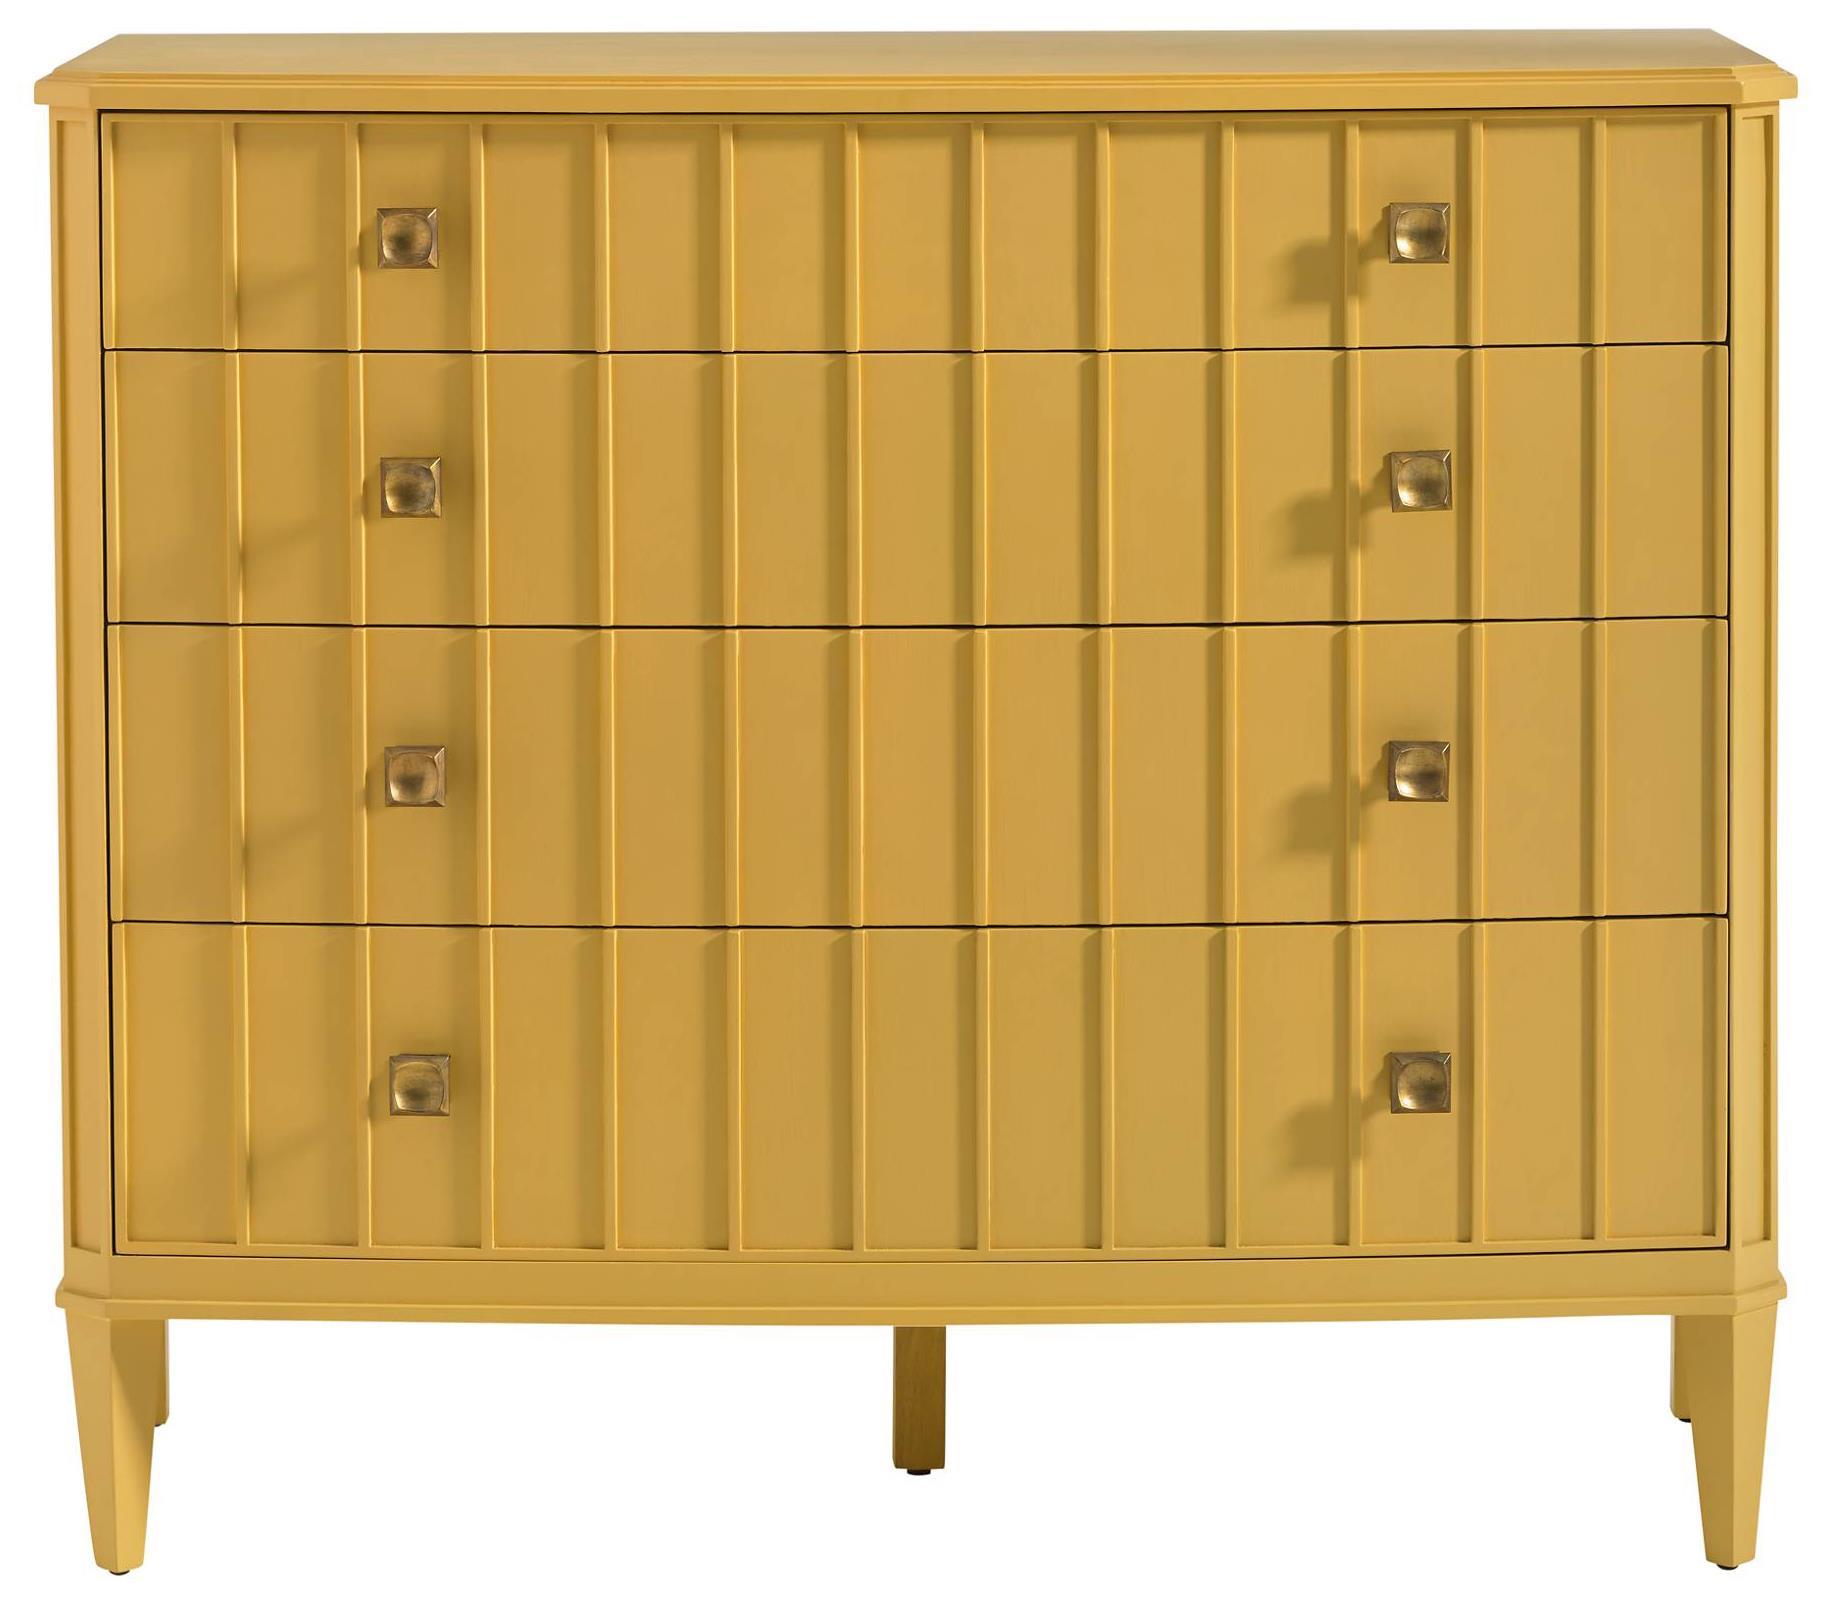 Stanley Furniture Crestaire Monterey Single Dresser - Item Number: 436-73-04